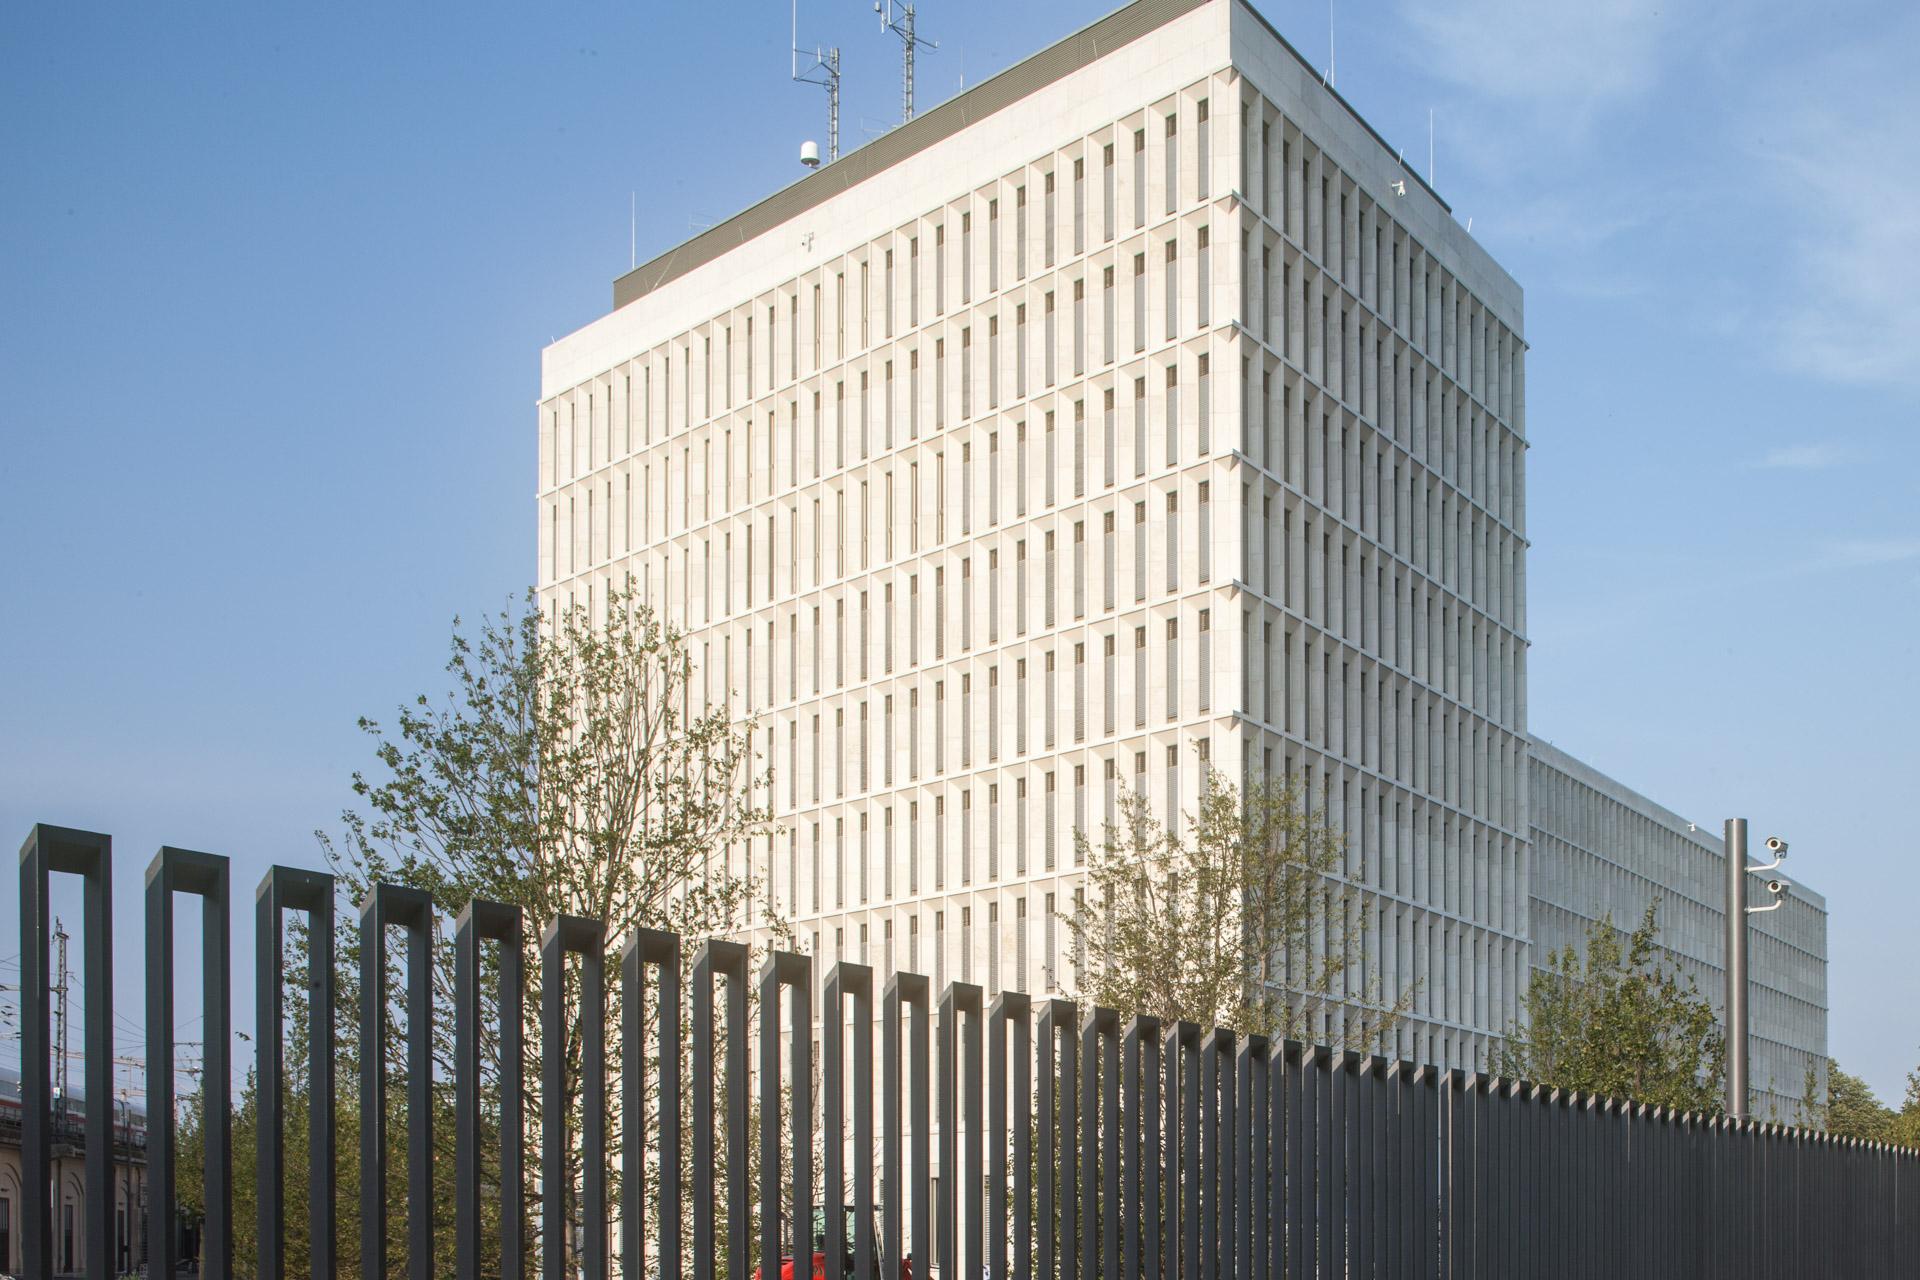 Bundesministerium des Innern, Berlin (DE)